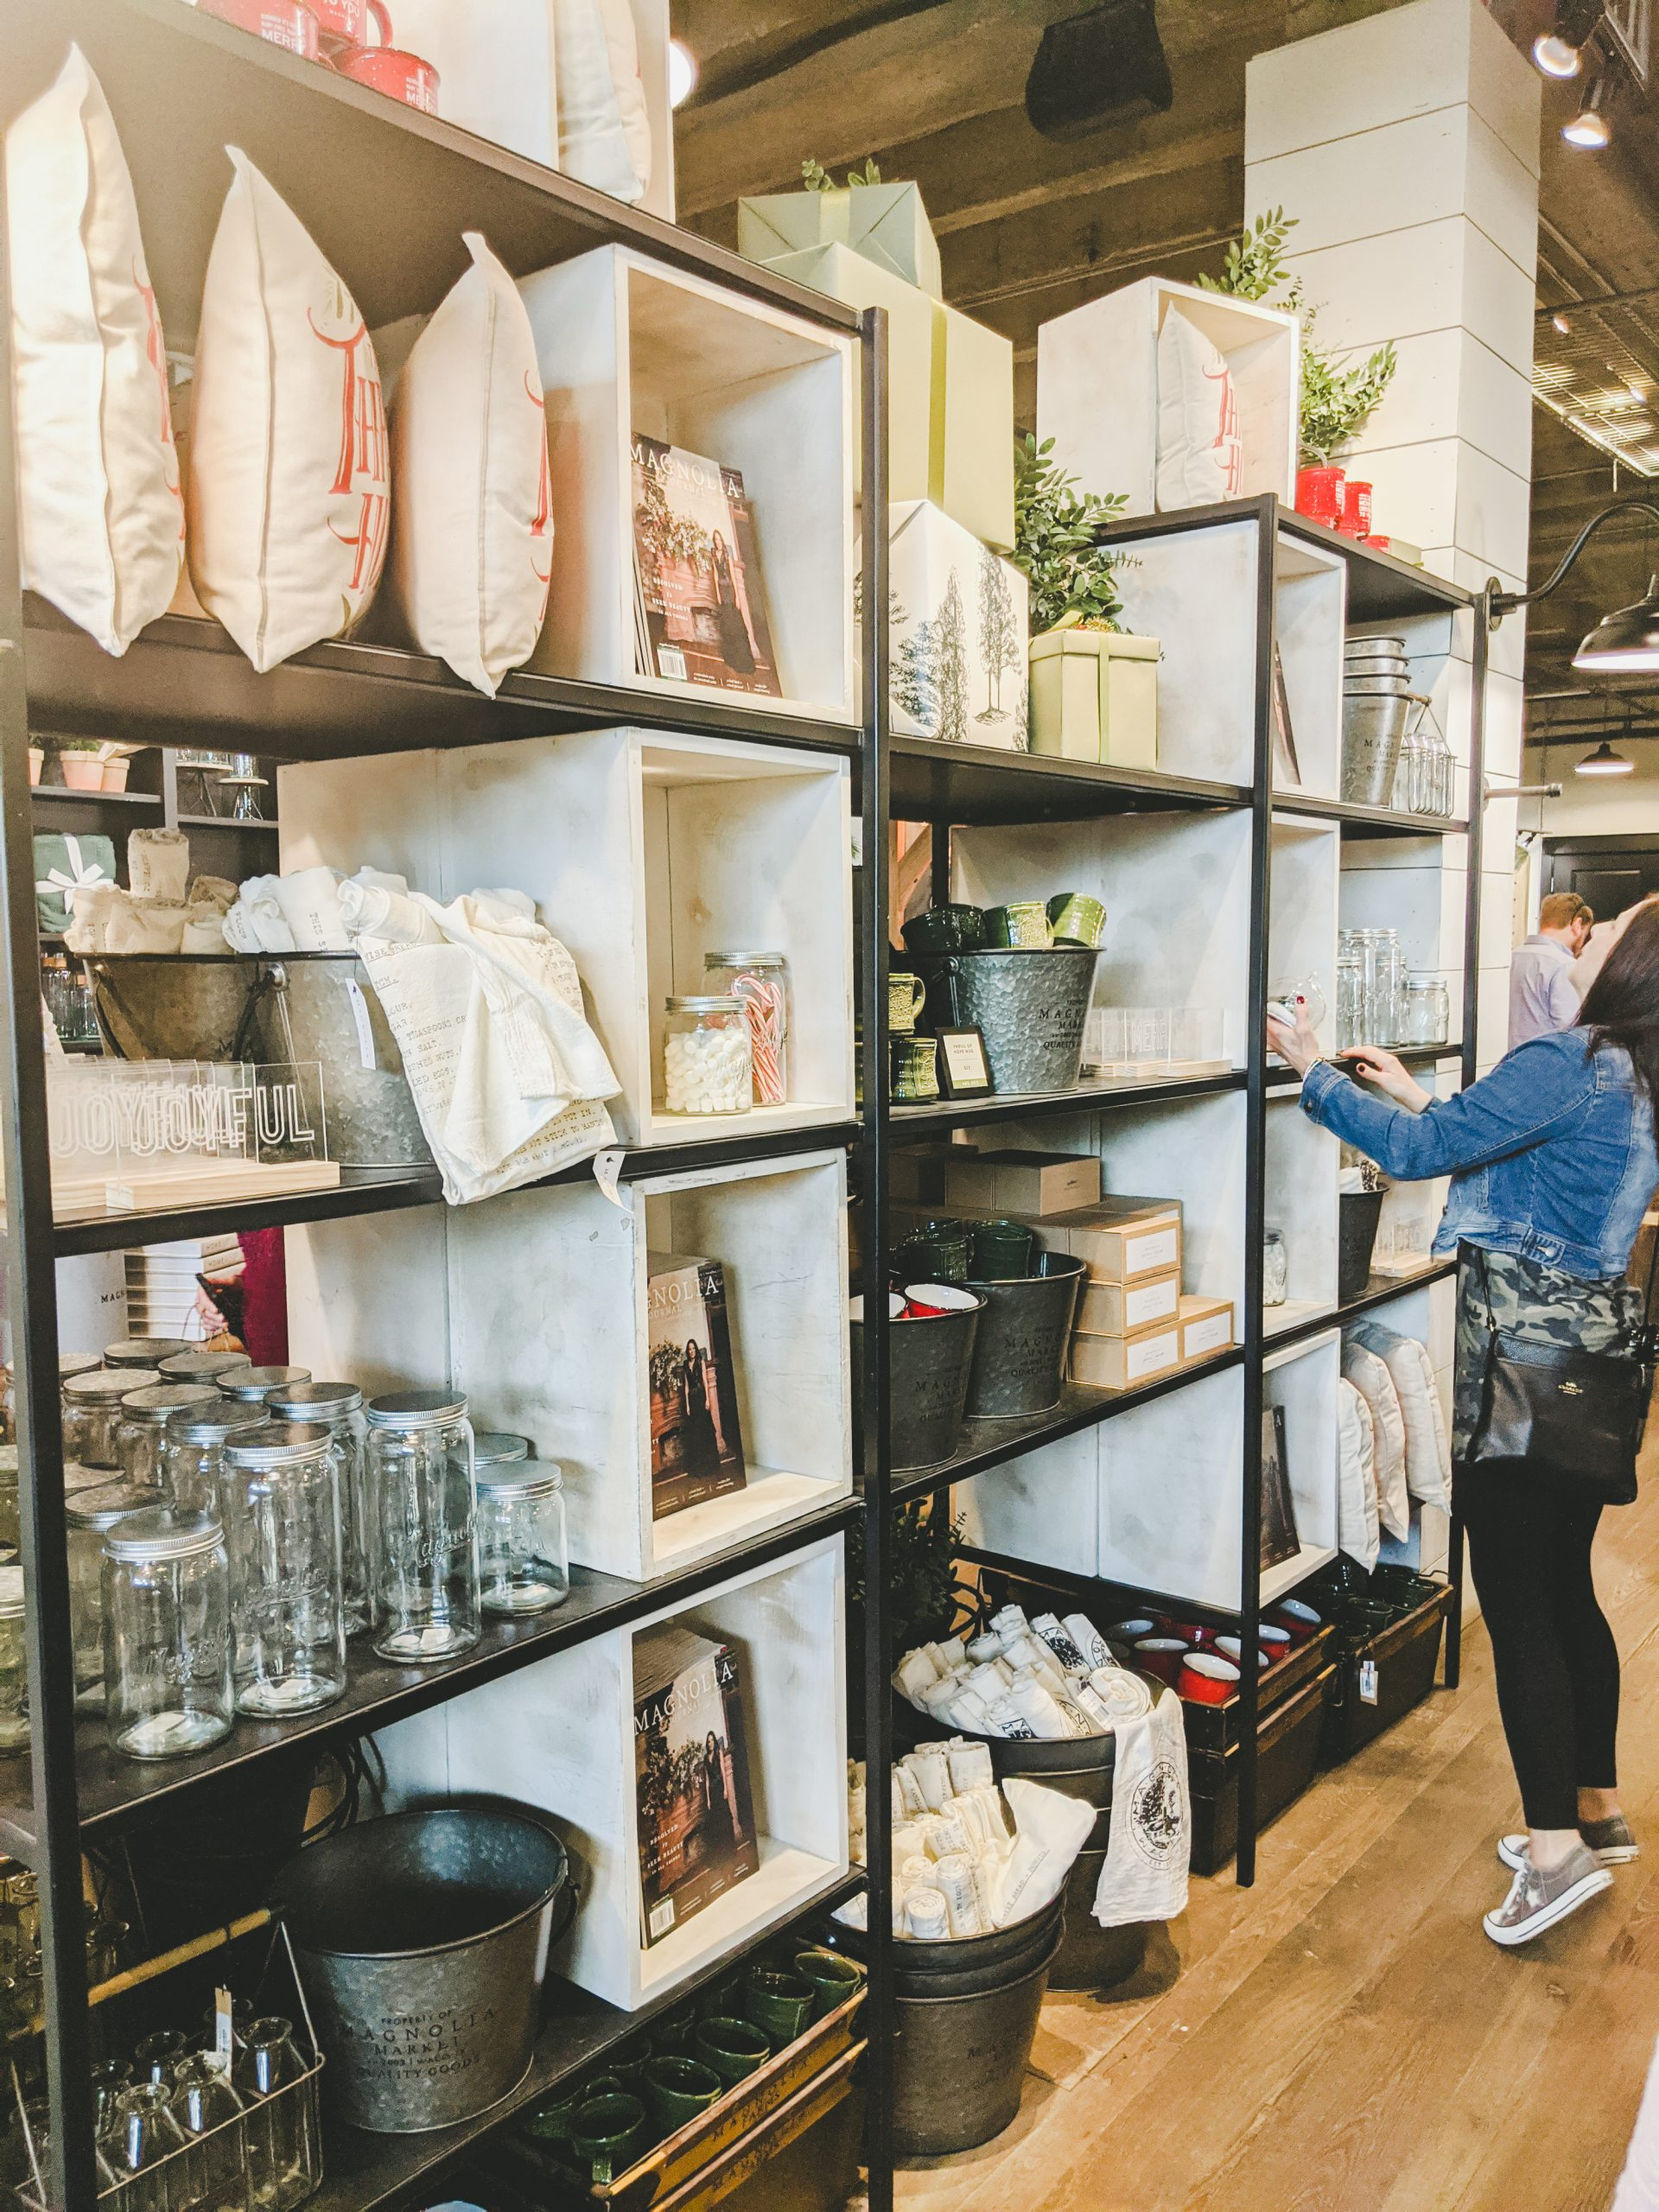 magnolia market display shelf with pillows